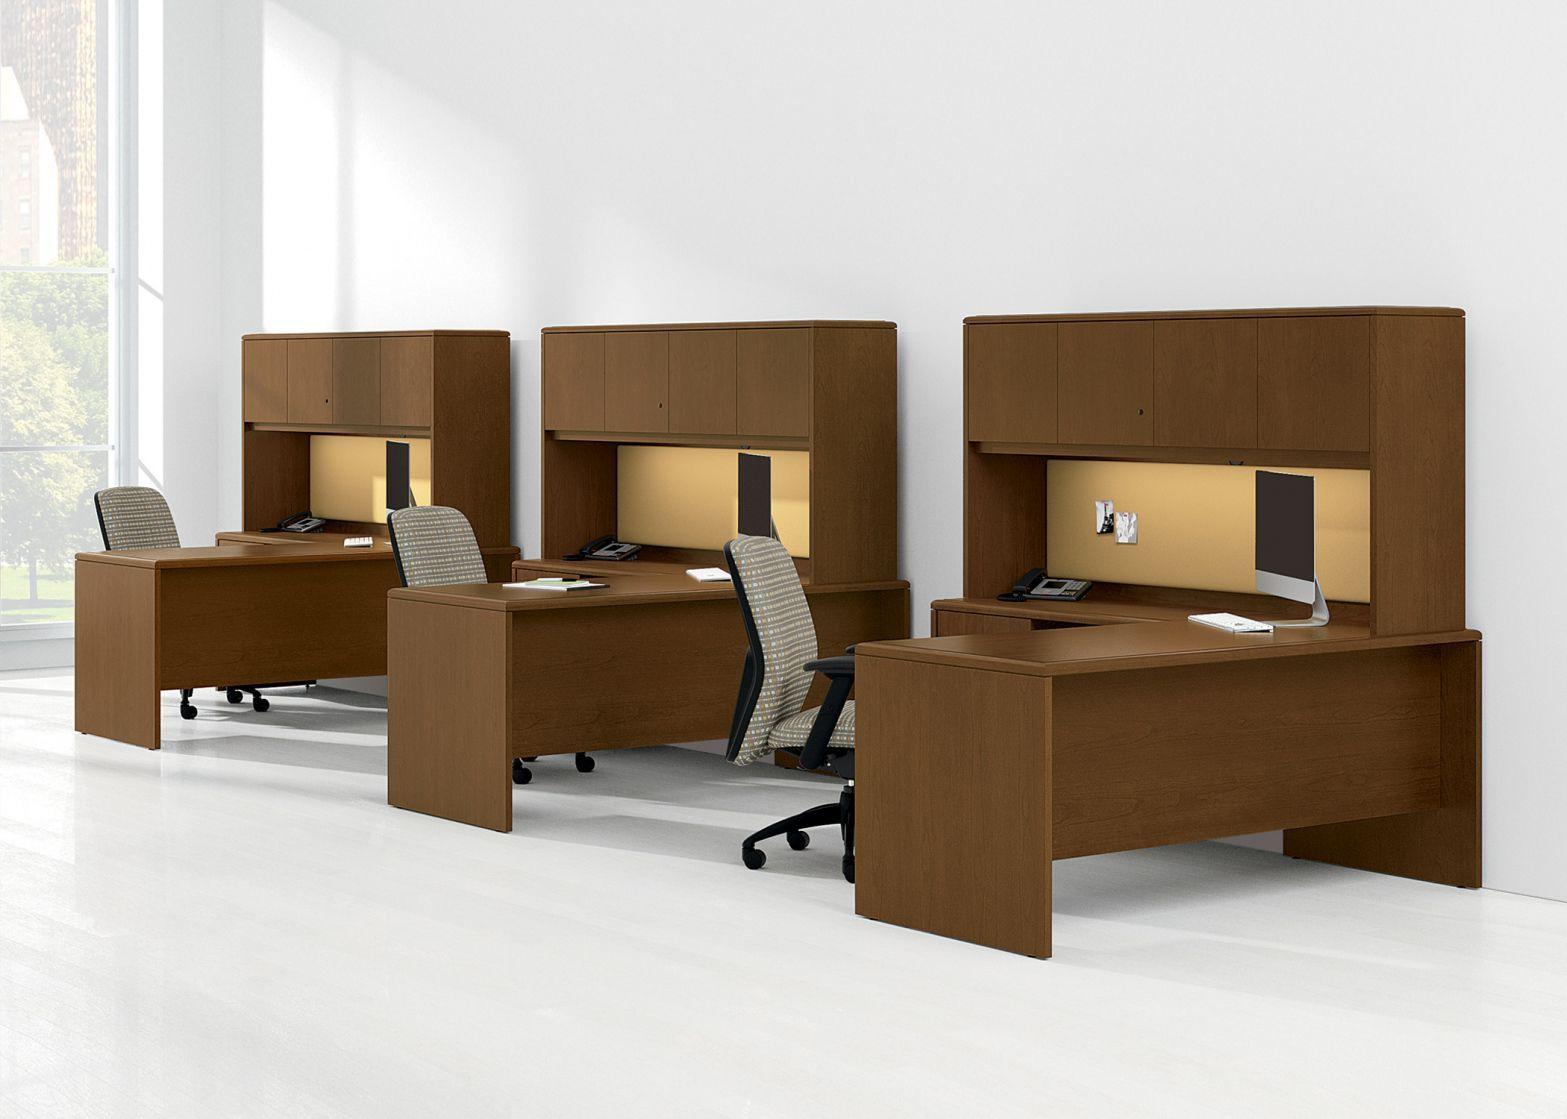 Image result for office furniture design in walnut finish